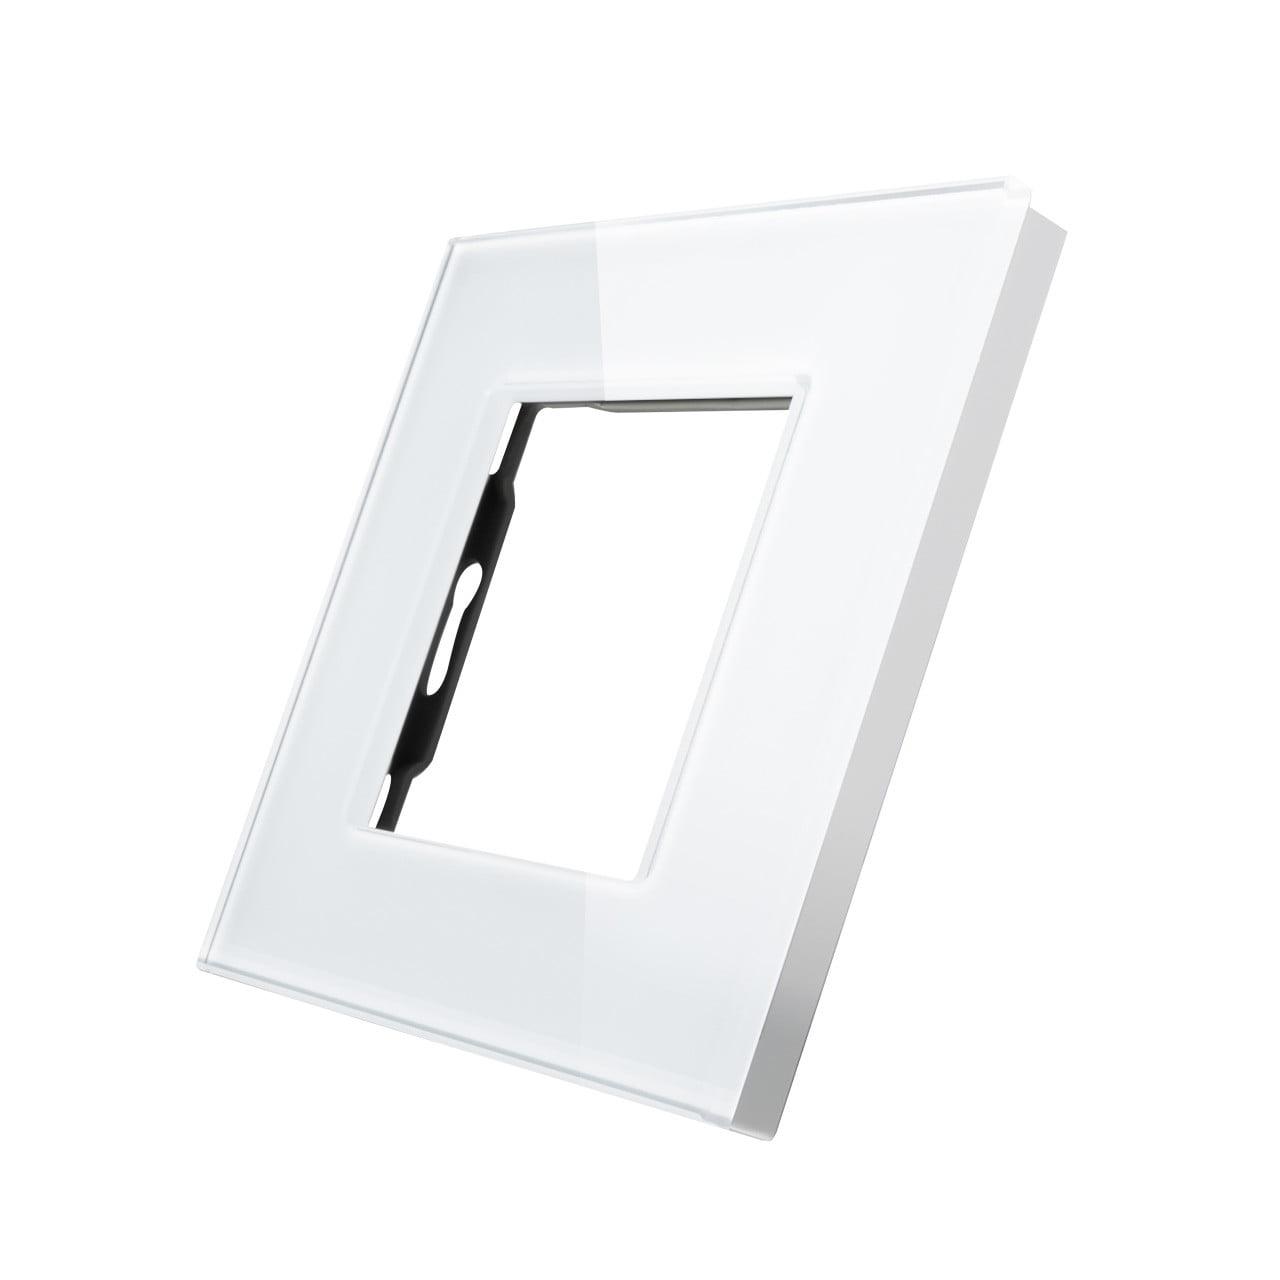 Rama priza simpla din sticla, 2 module, Smart Home